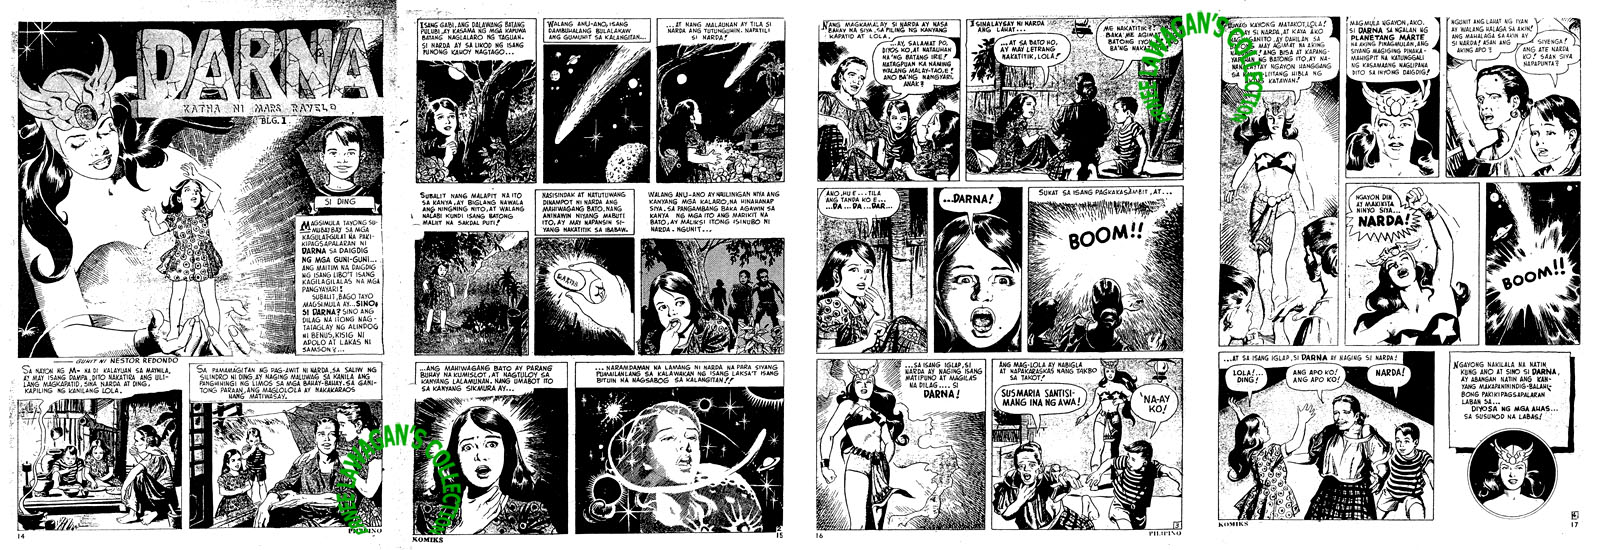 Gina Pareno (b. 1949) Gina Pareno (b. 1949) new images